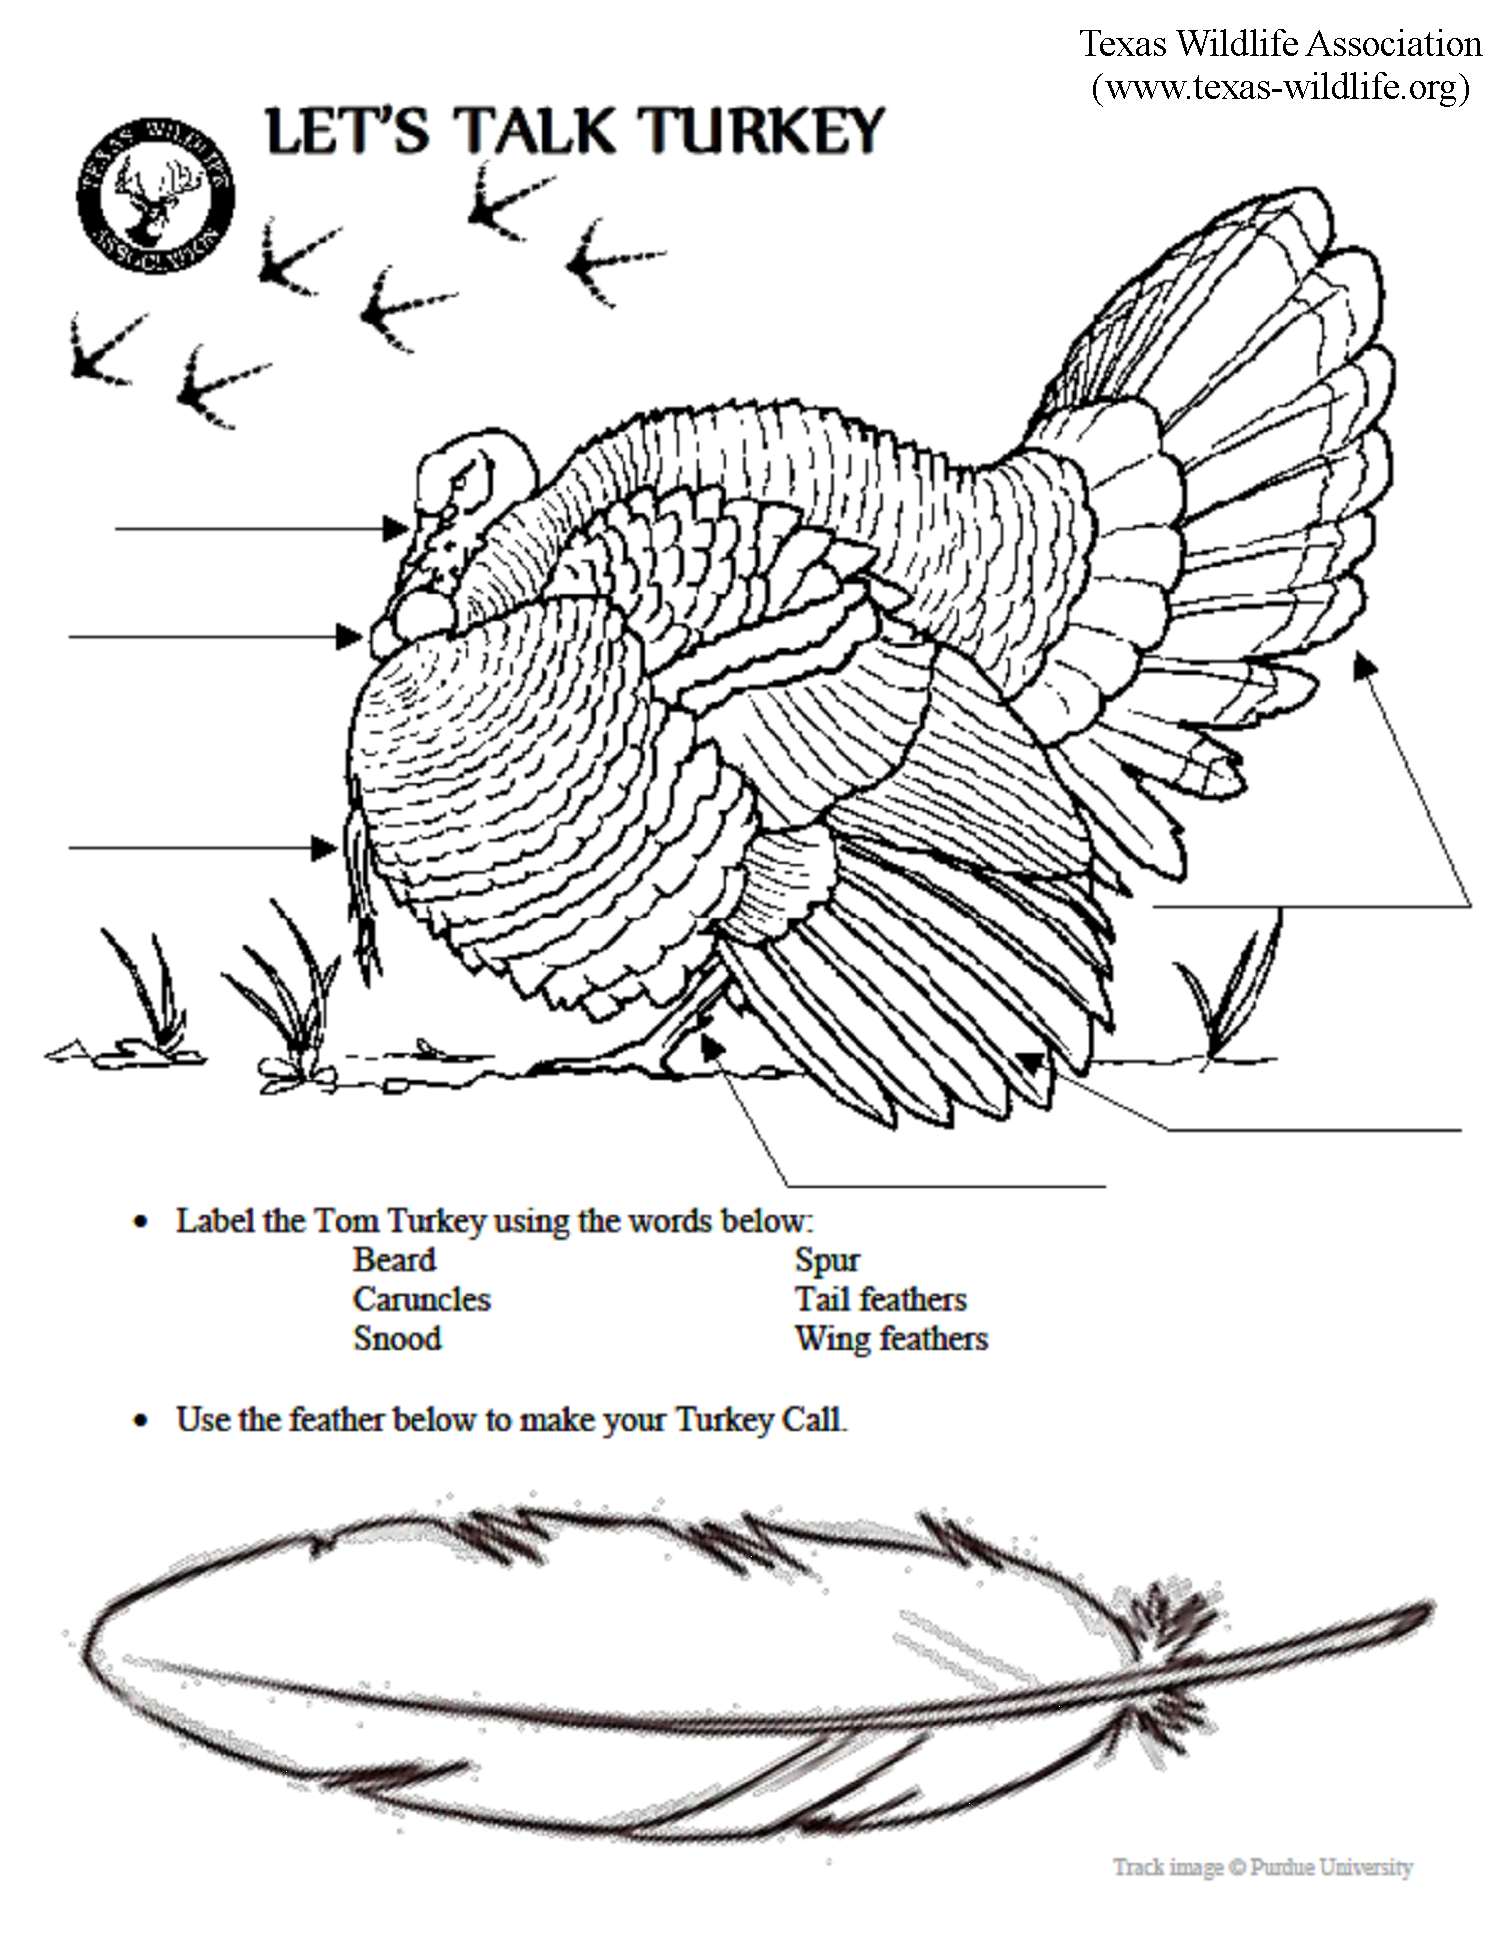 Let\'s Talk Turkey Anatomy Page - Texas Wildlife Association ...